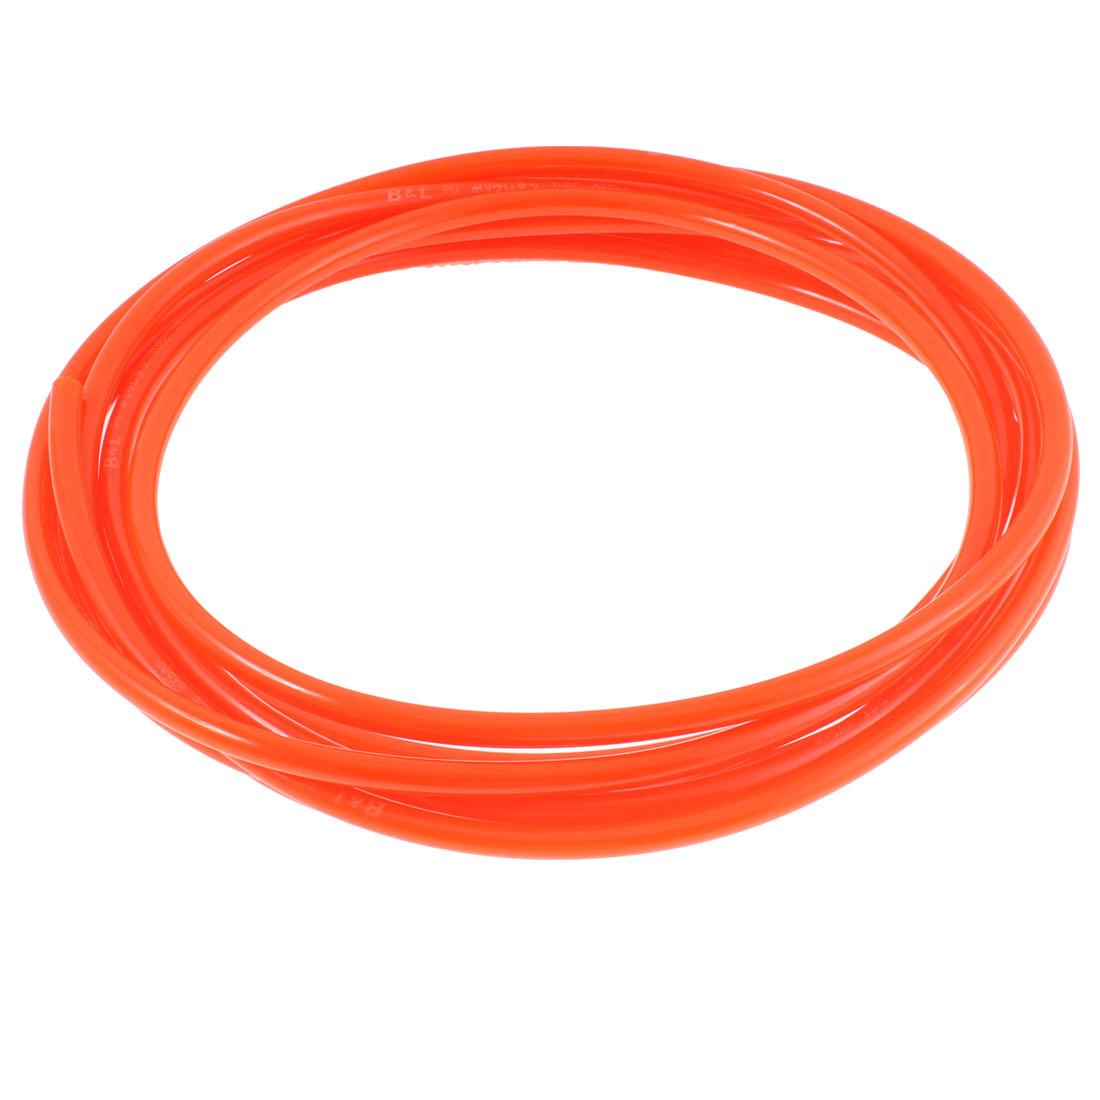 8mm OD 5mm Inner Dia PU Pneumatic Air Tubing Pipe Hose 6M Length Orange Red